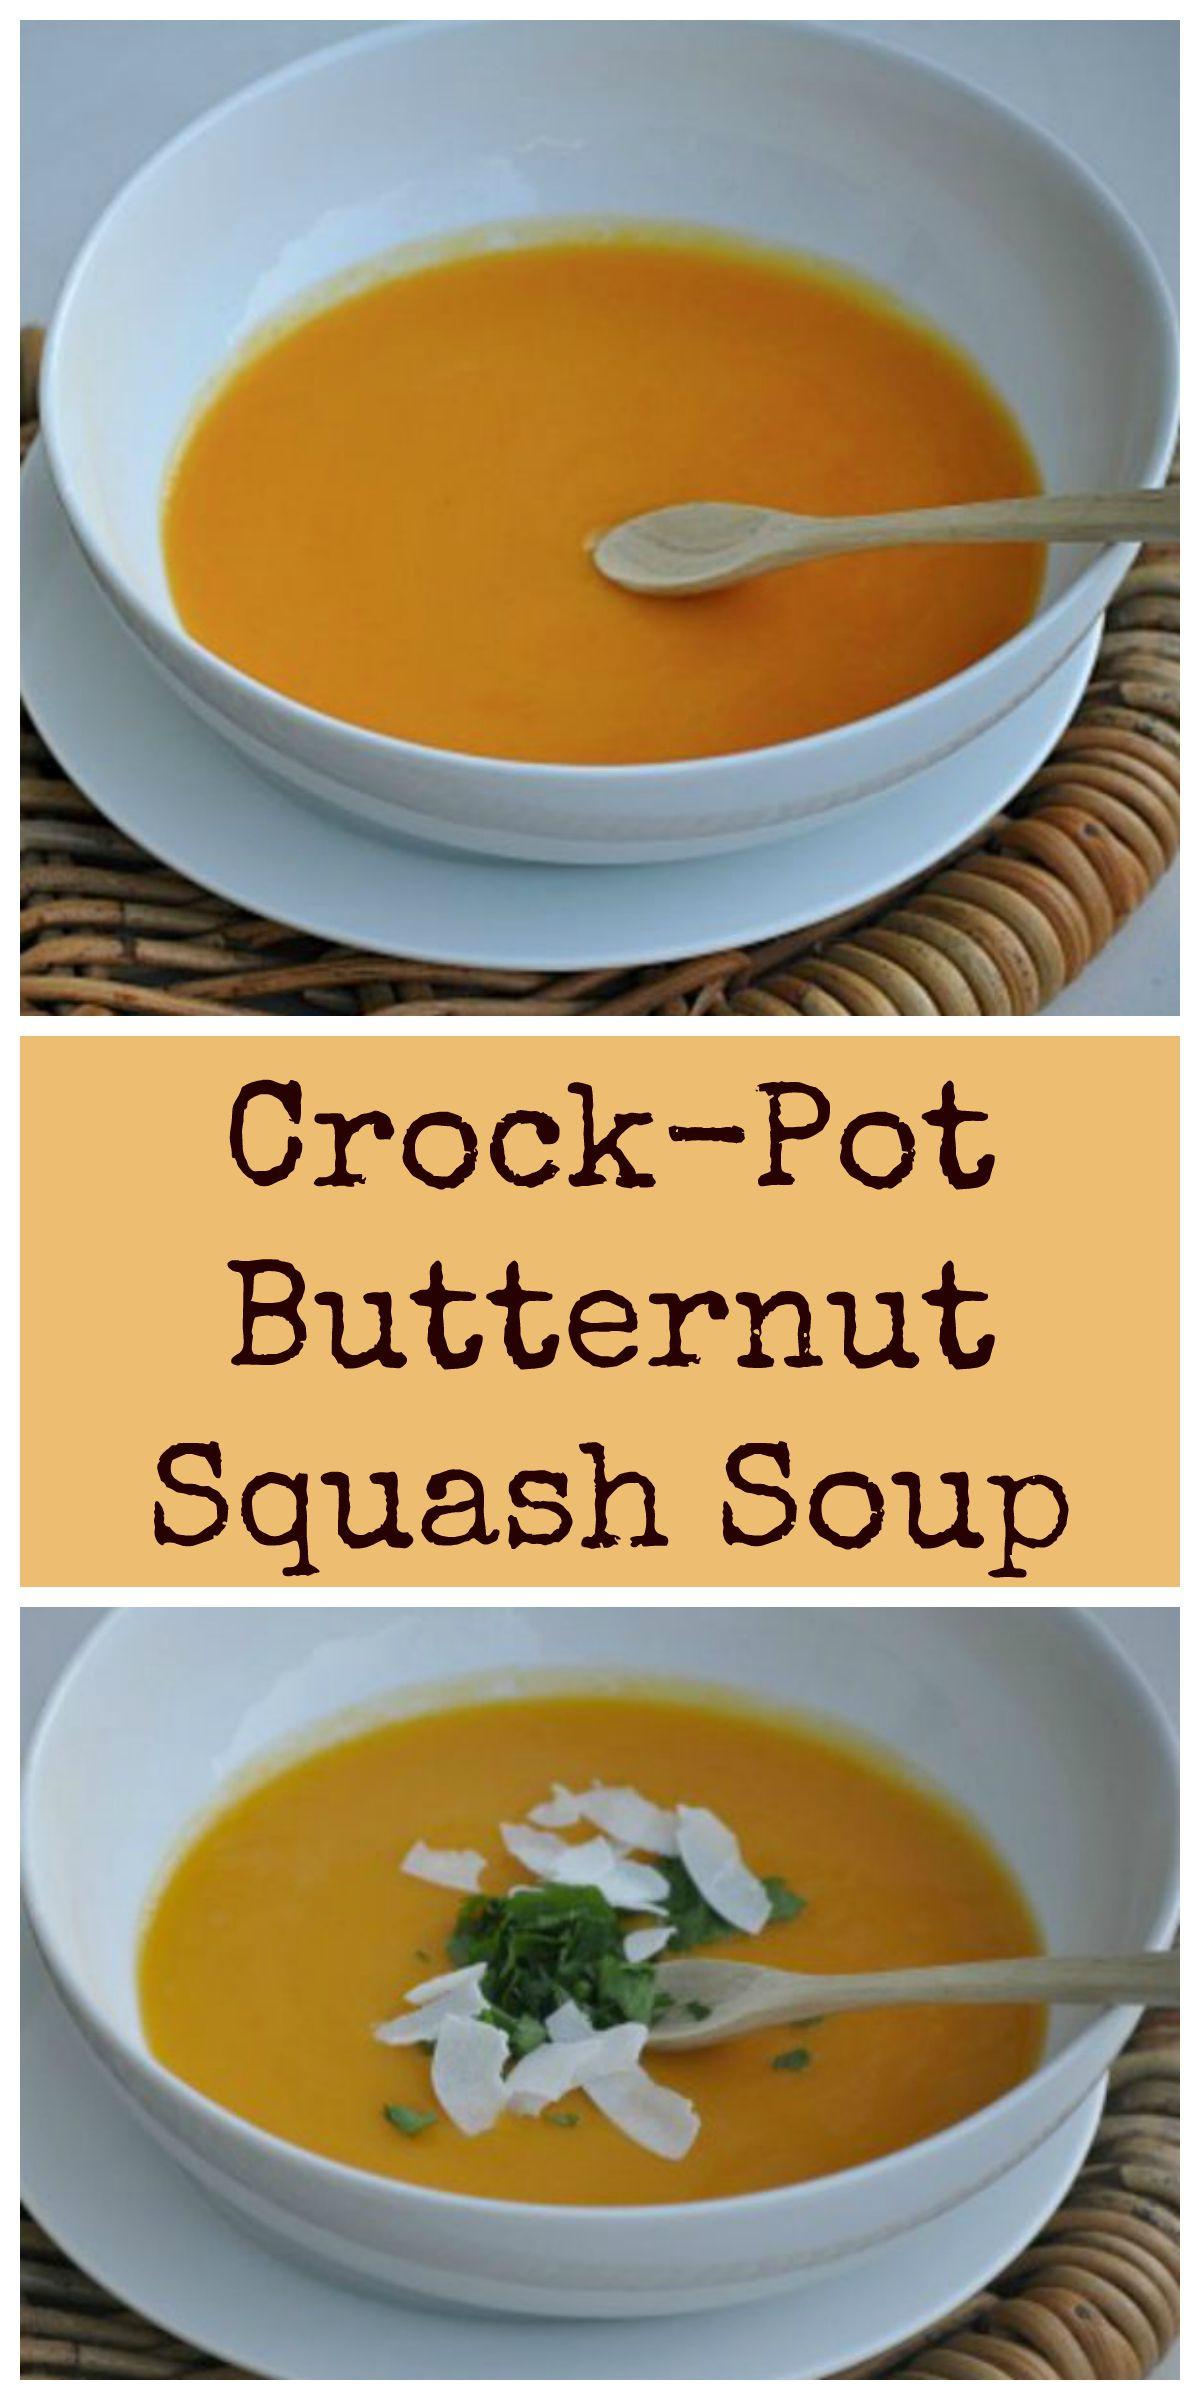 Butternut Squash Soup Crockpot  crock pot Archives Dining with Alice